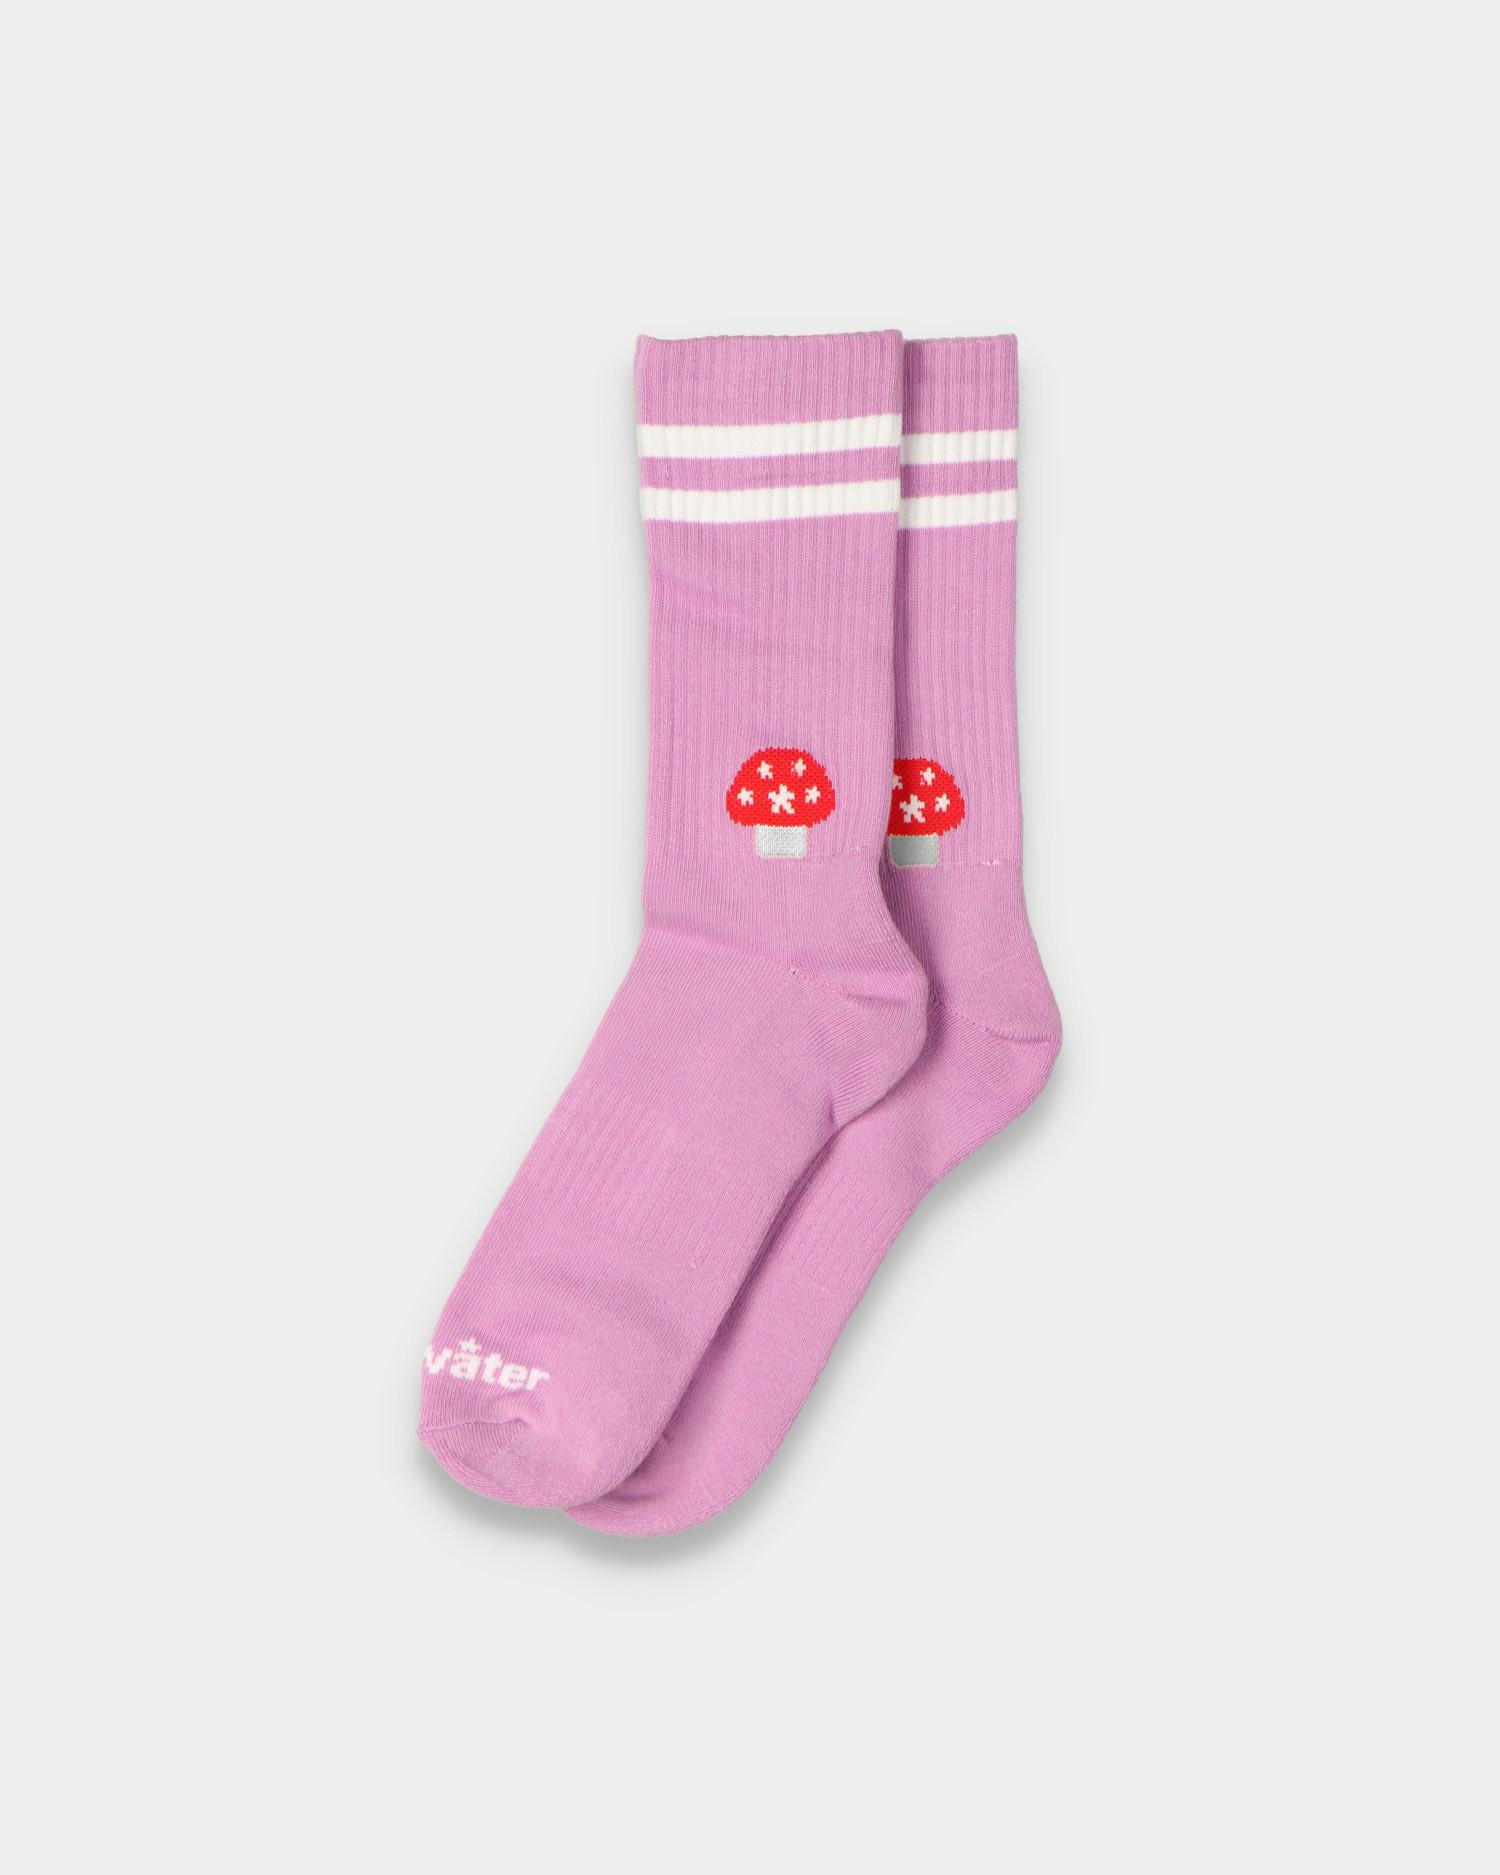 Stingwater Athletic Aga Sock Lavender